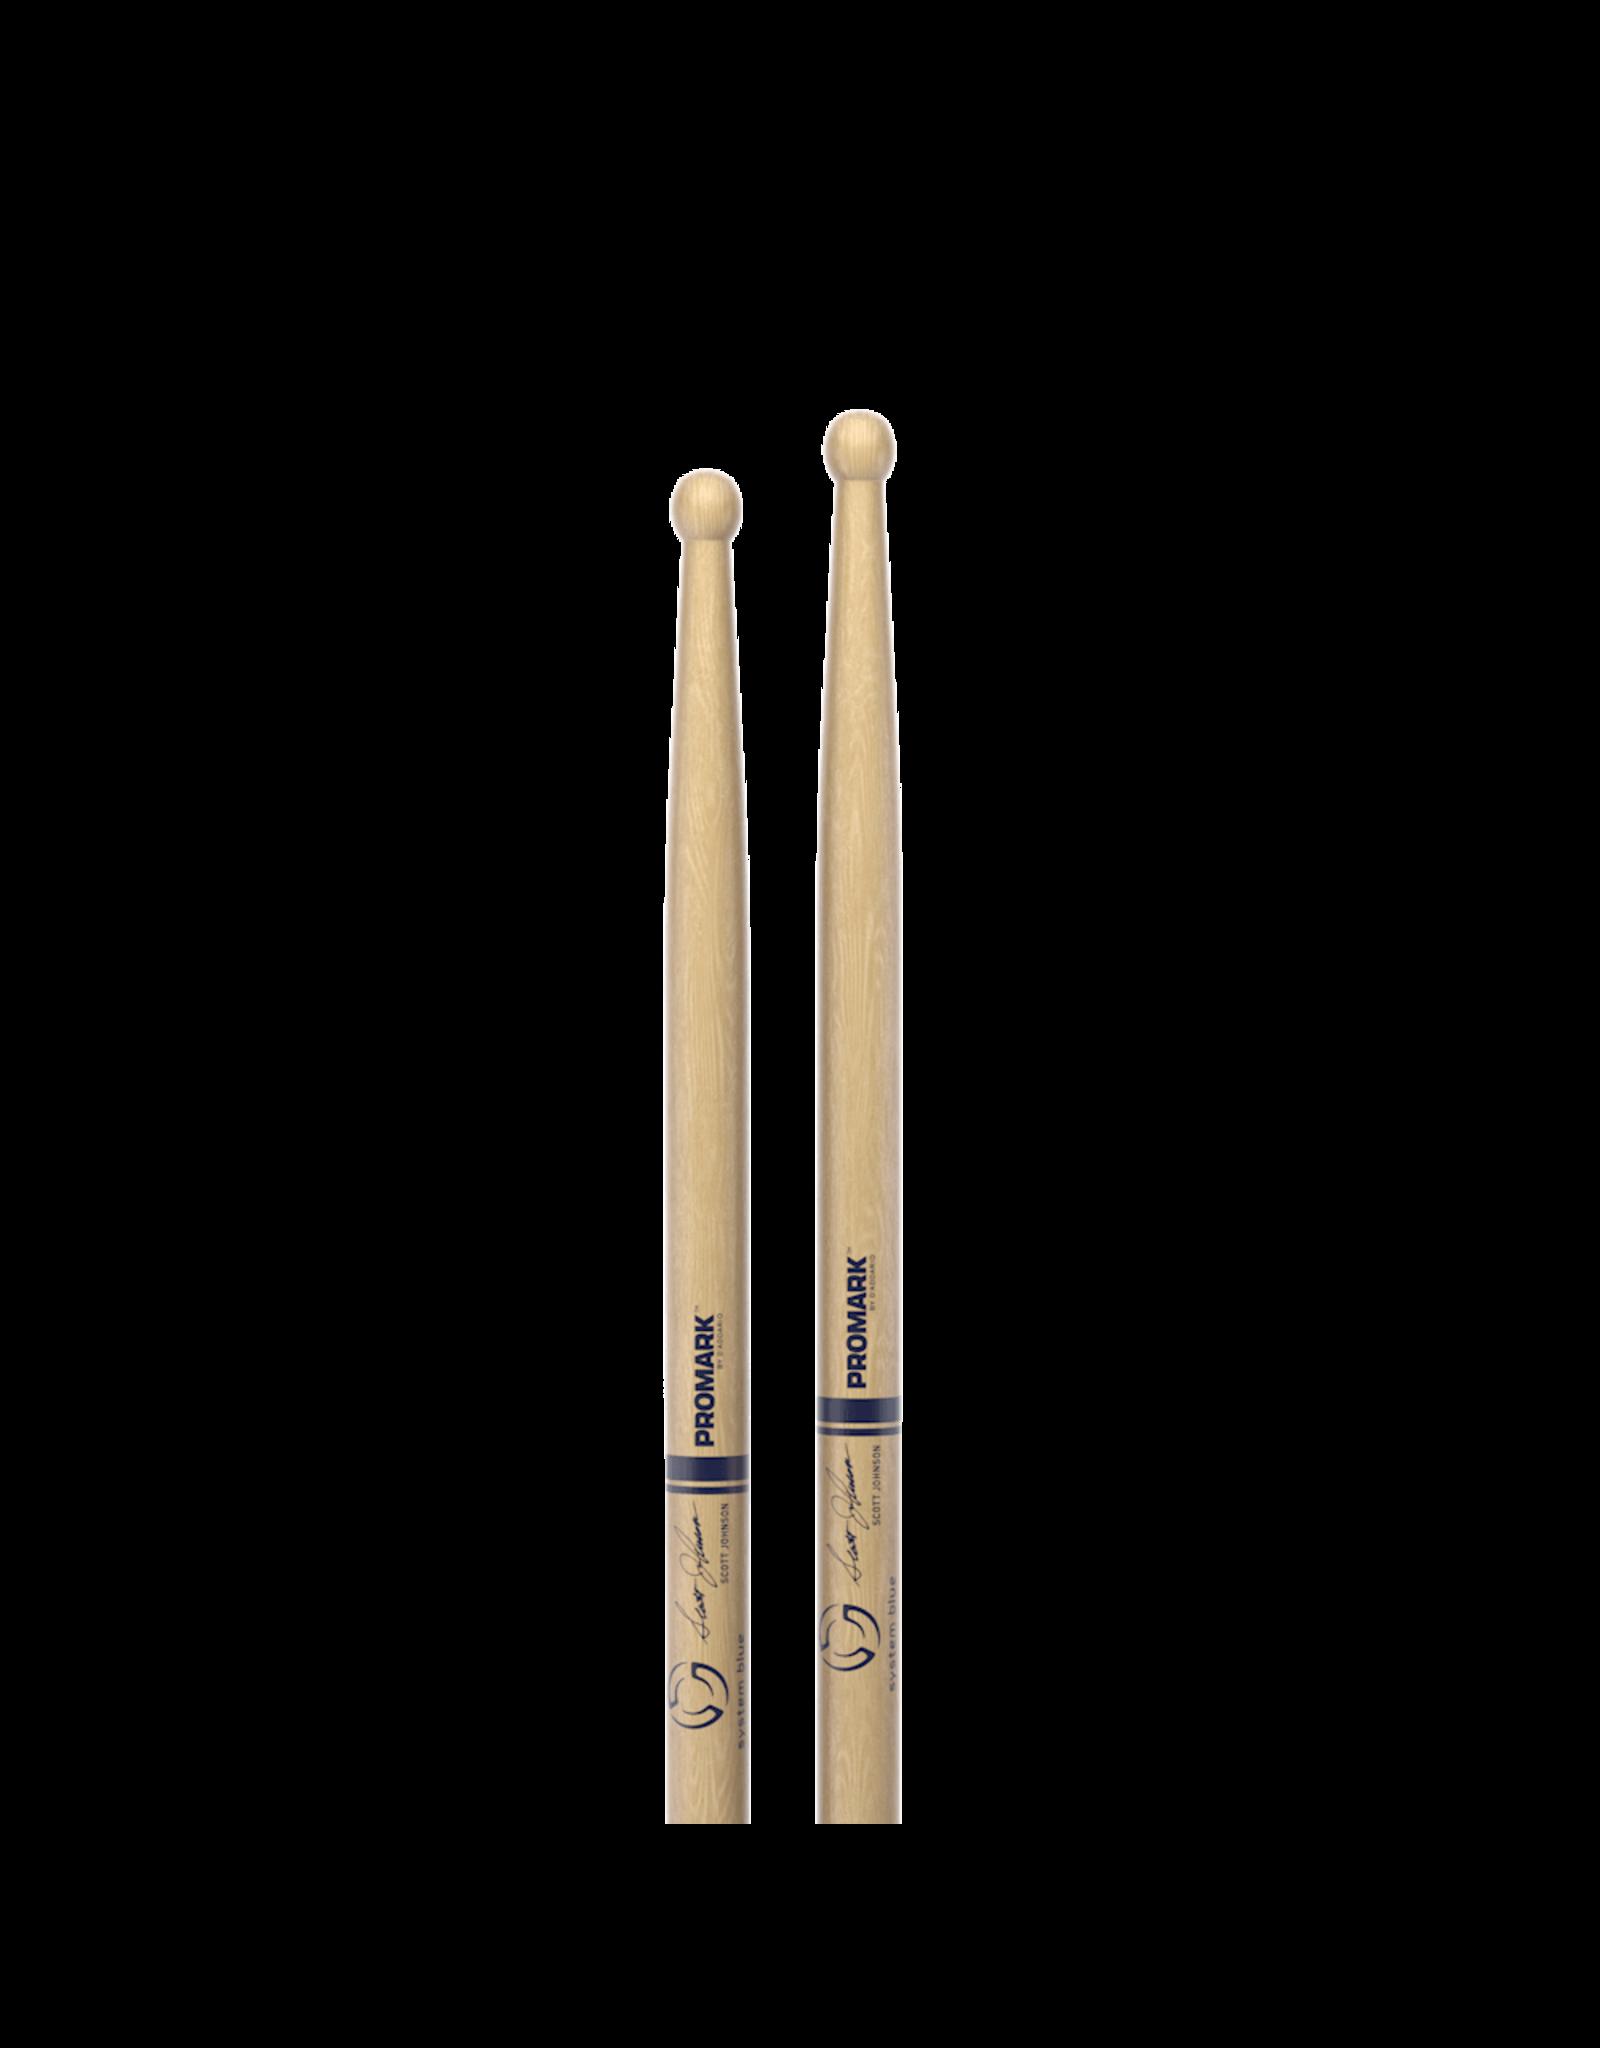 Promark Promark SCOTT JOHNSON DC17 Signature Hickory Wood Tip Drumstick